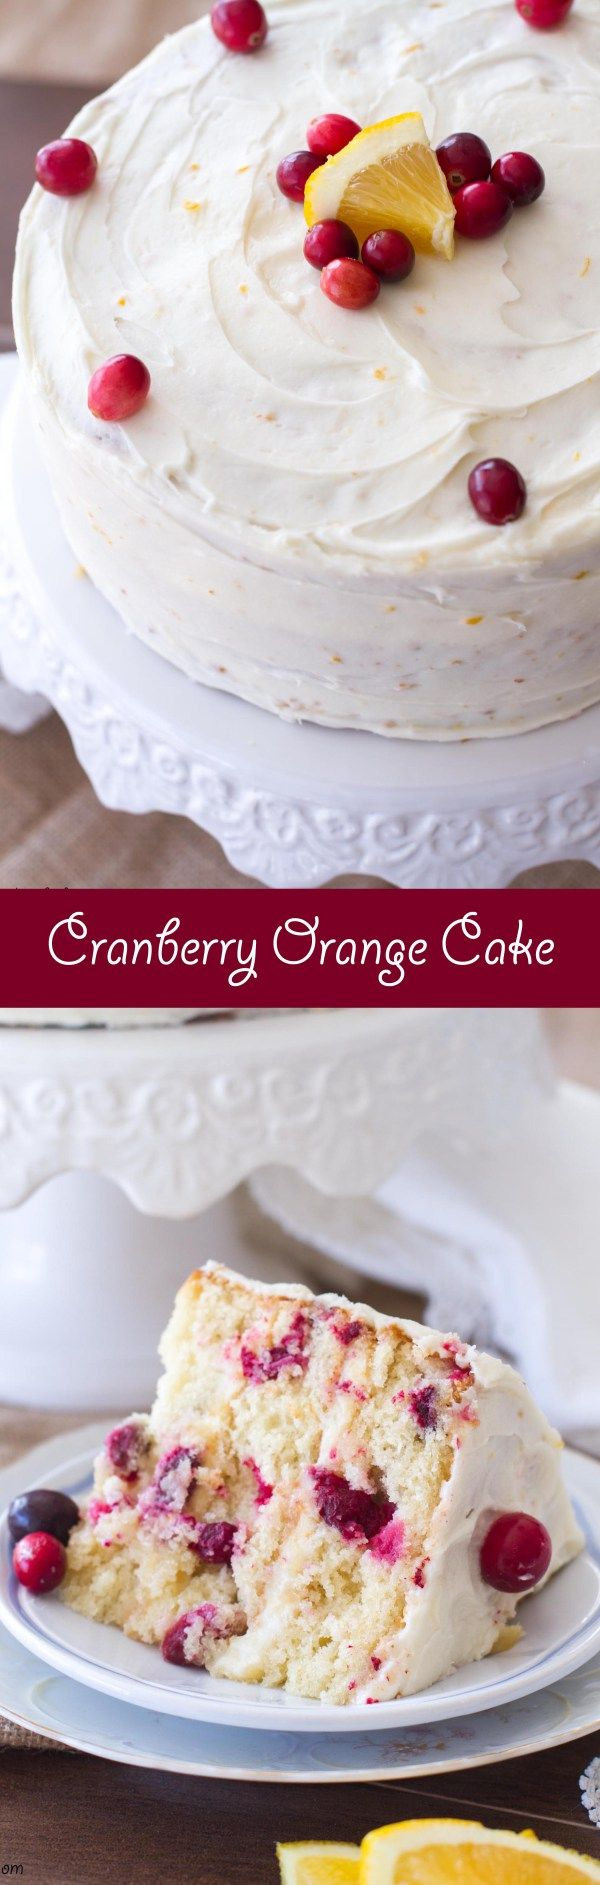 Best 25+ Christmas desserts ideas on Pinterest | Holiday desserts ...